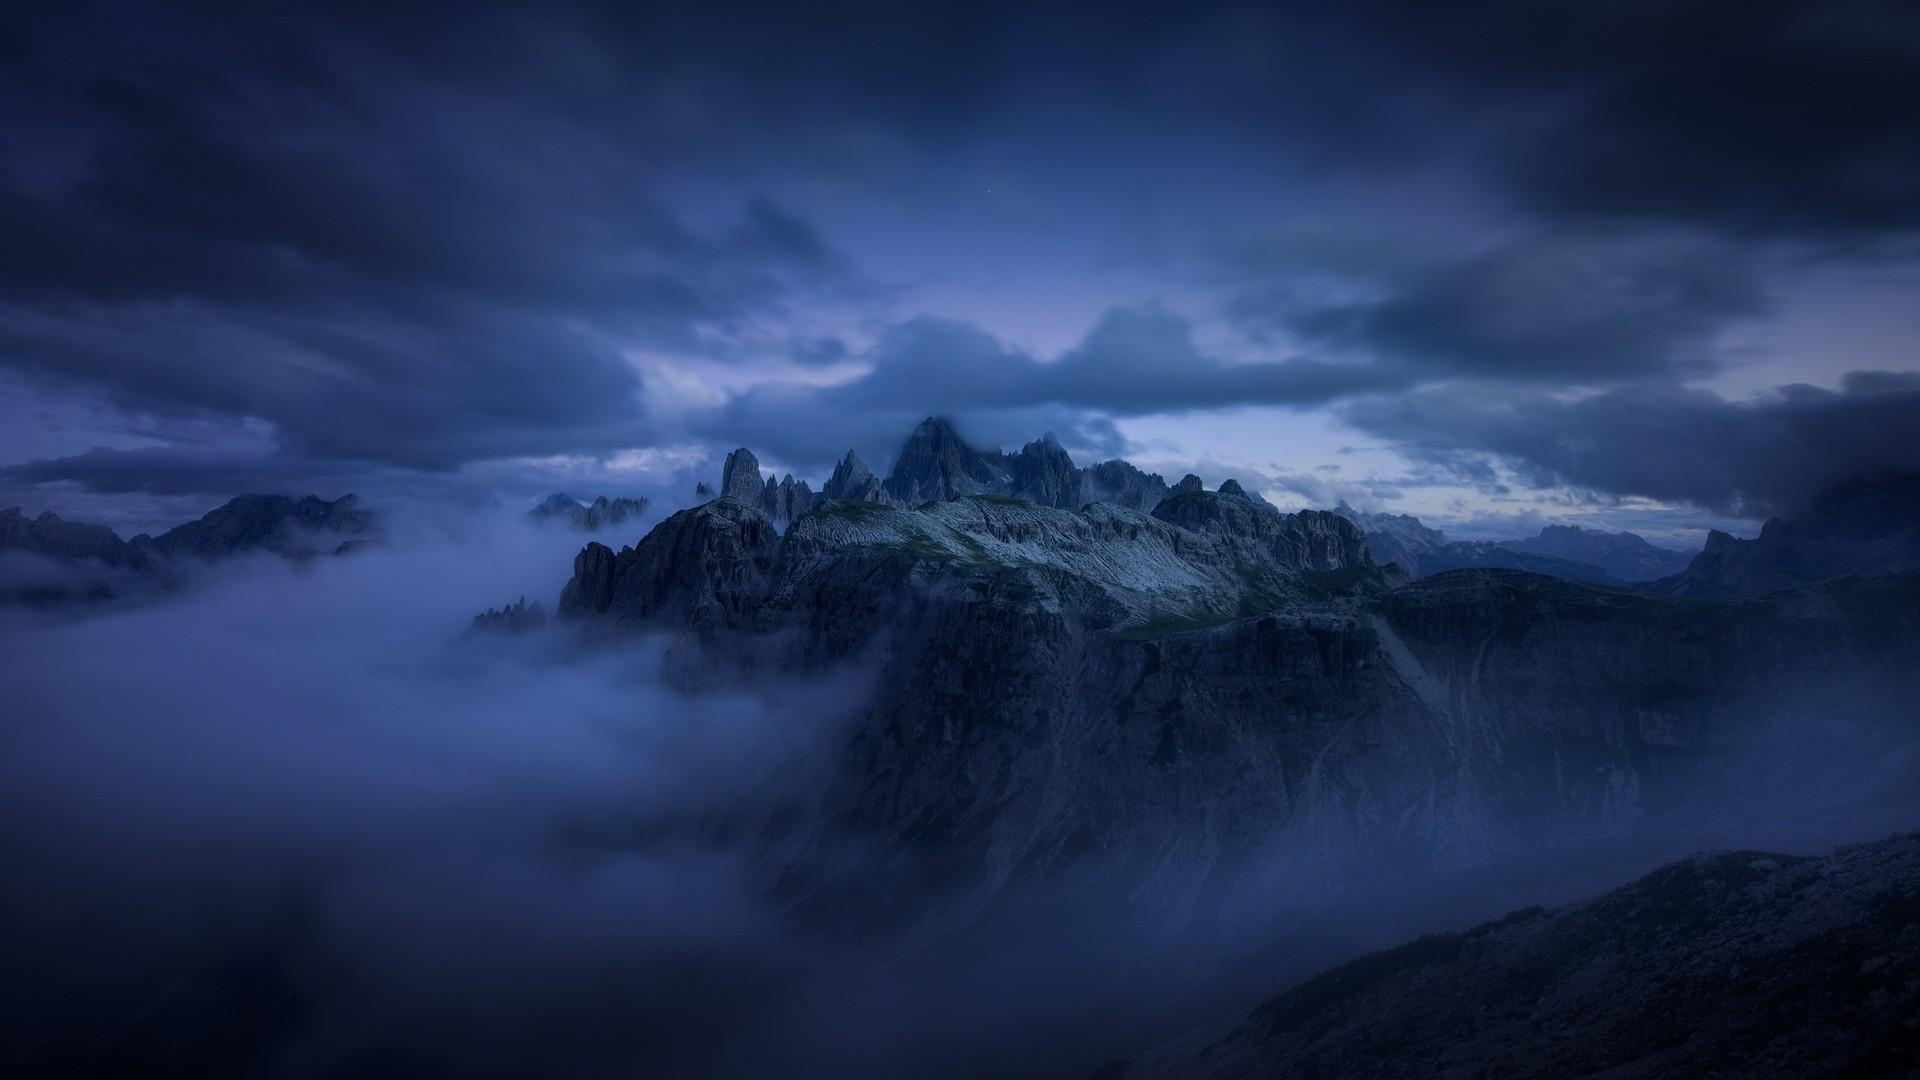 Dark Mountain Pic